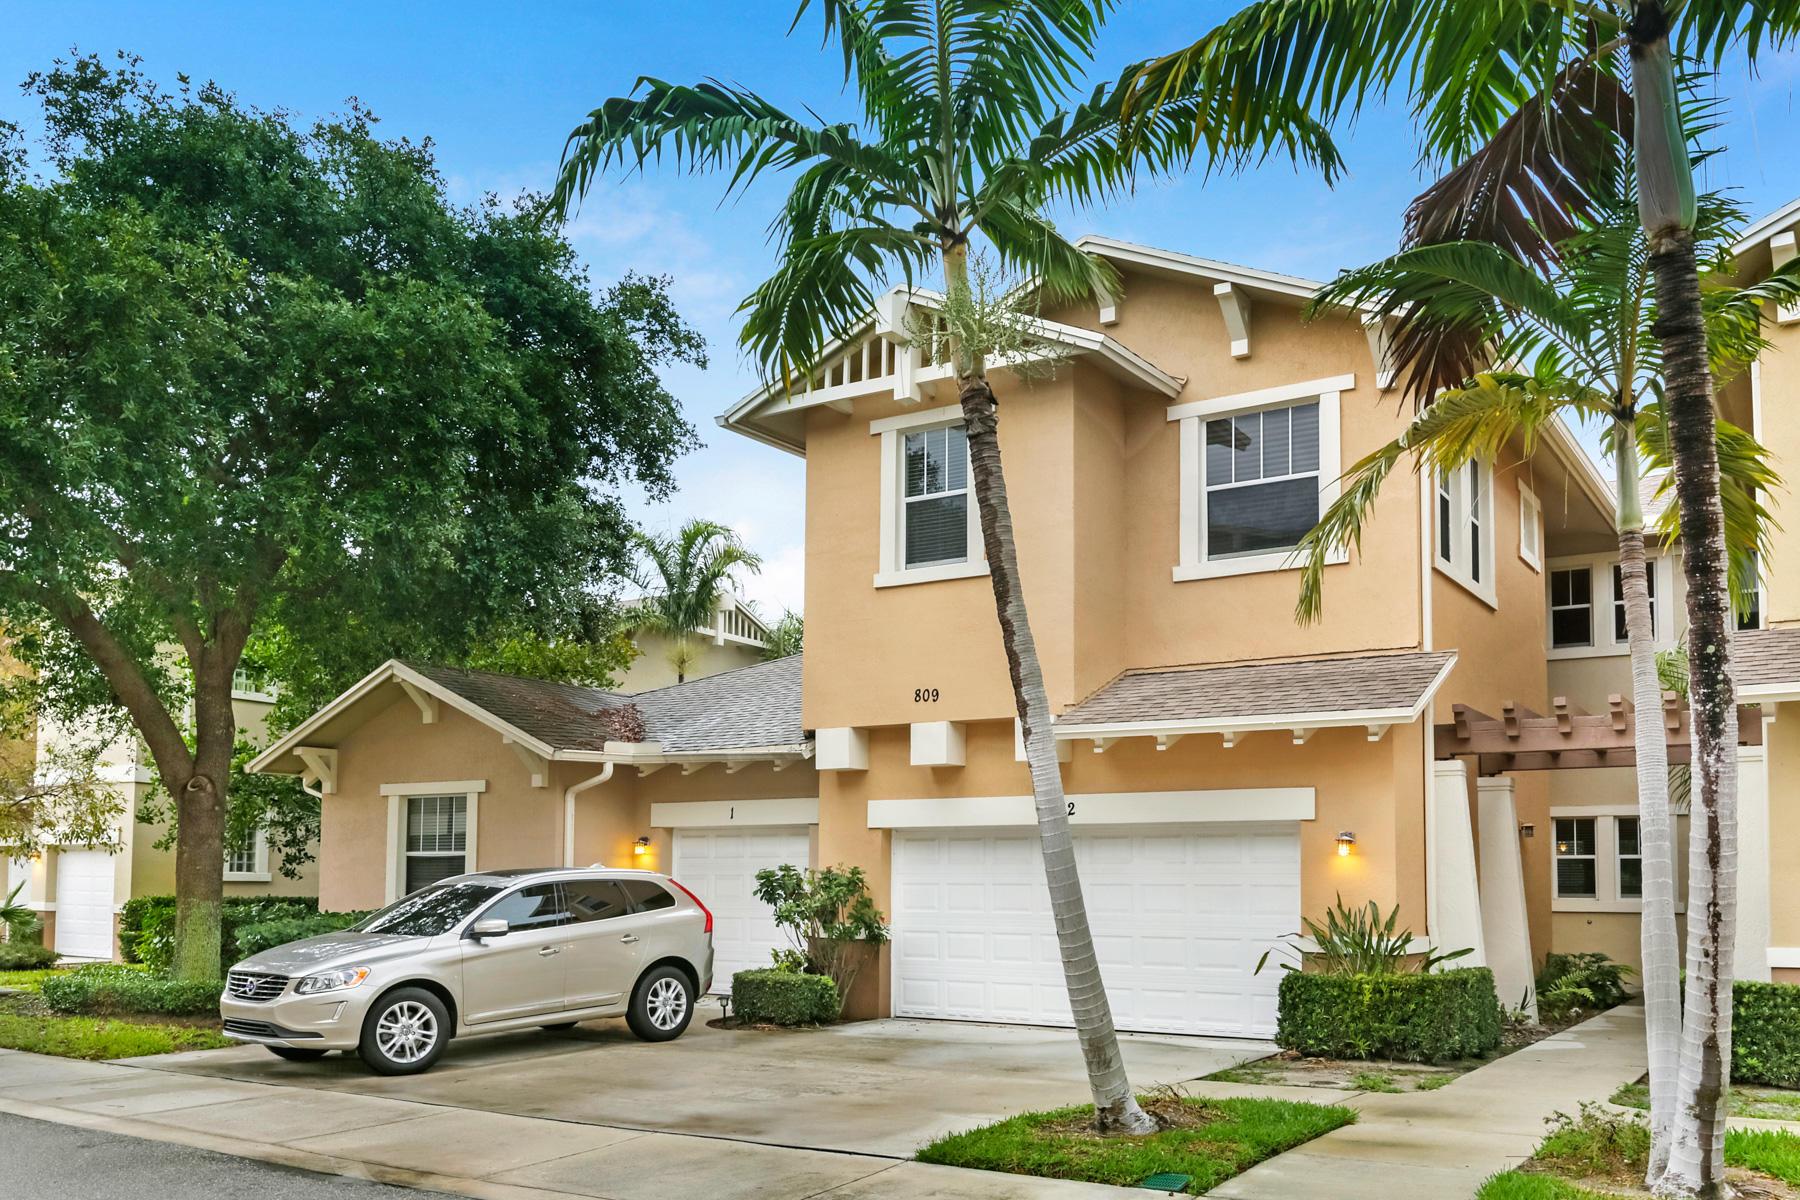 809 Marina Del Ray Lane 2 West Palm Beach, FL 33401